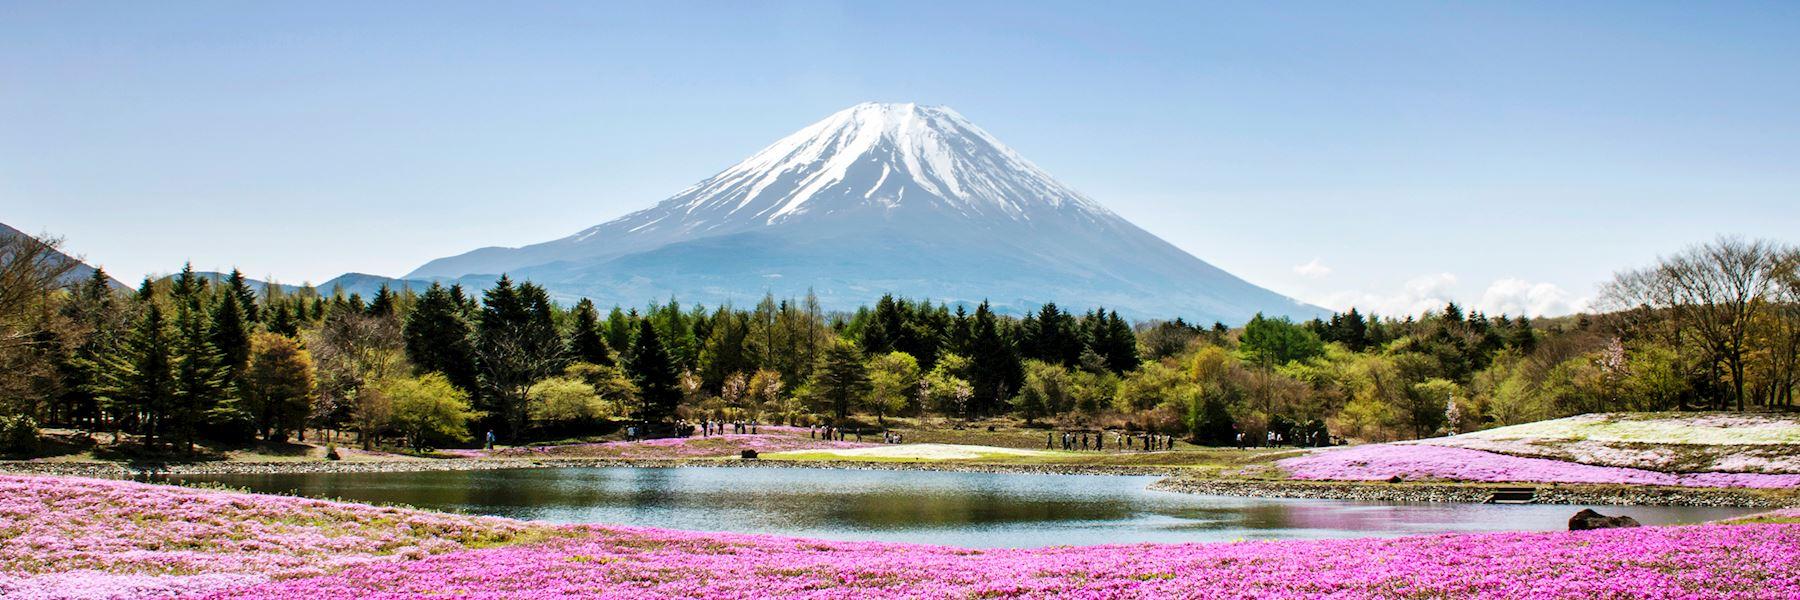 Visit Hakone Amp Mount Fuji On A Trip To Japan Audley Travel